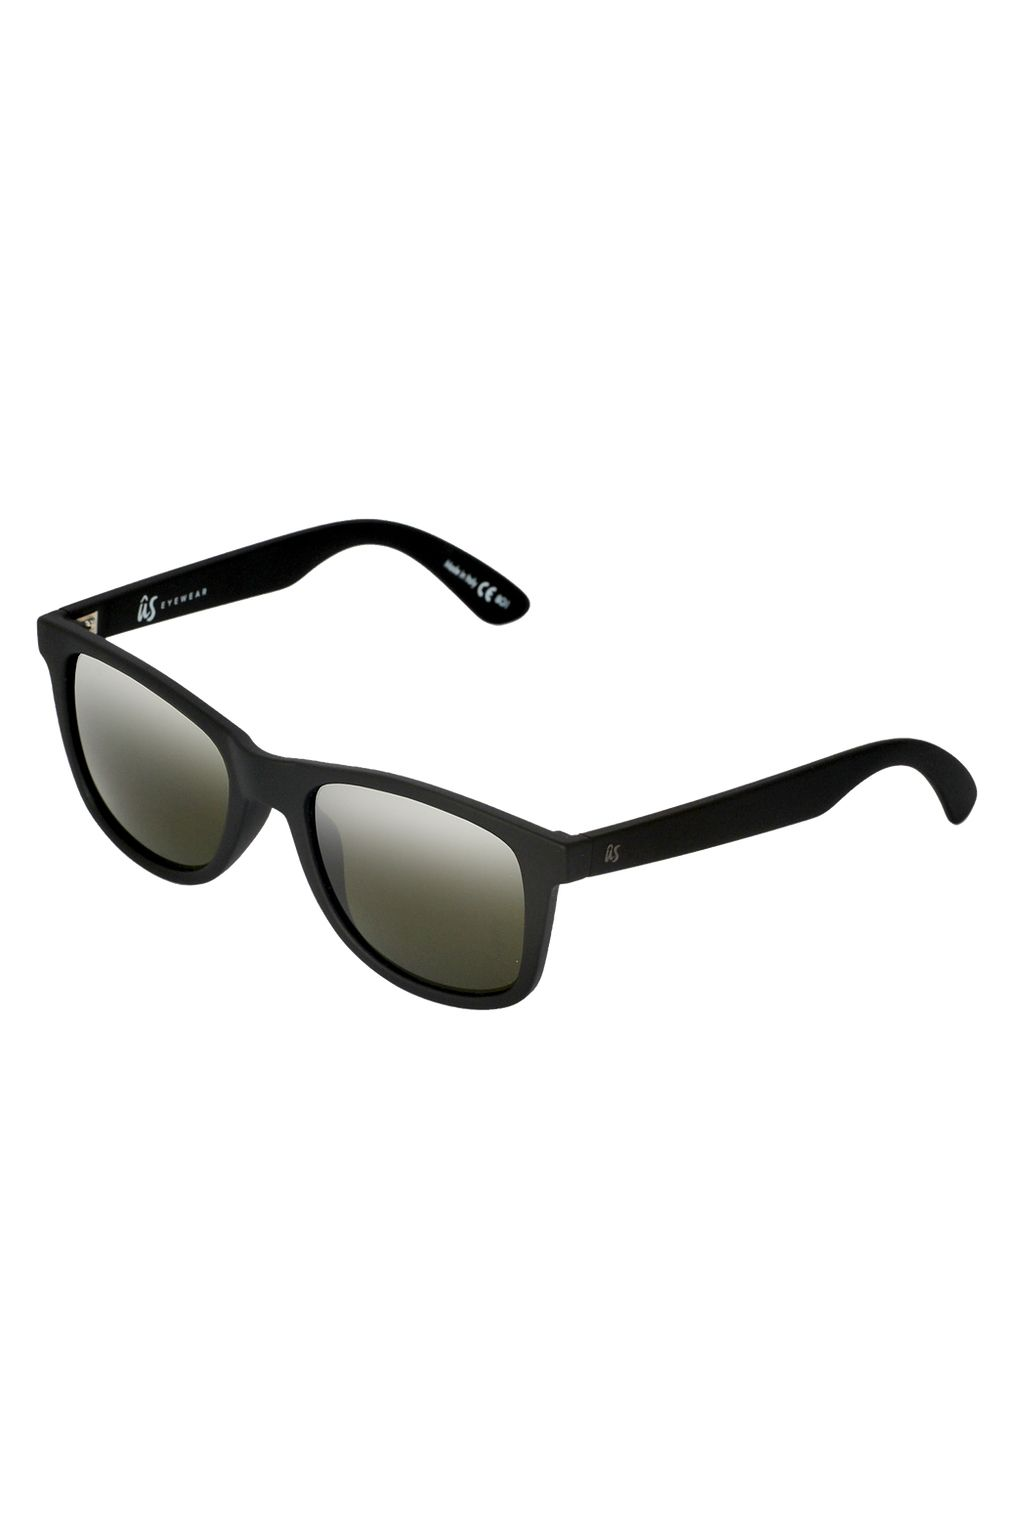 Oculos US MATY Matte Black/Vintage Grey Polarized